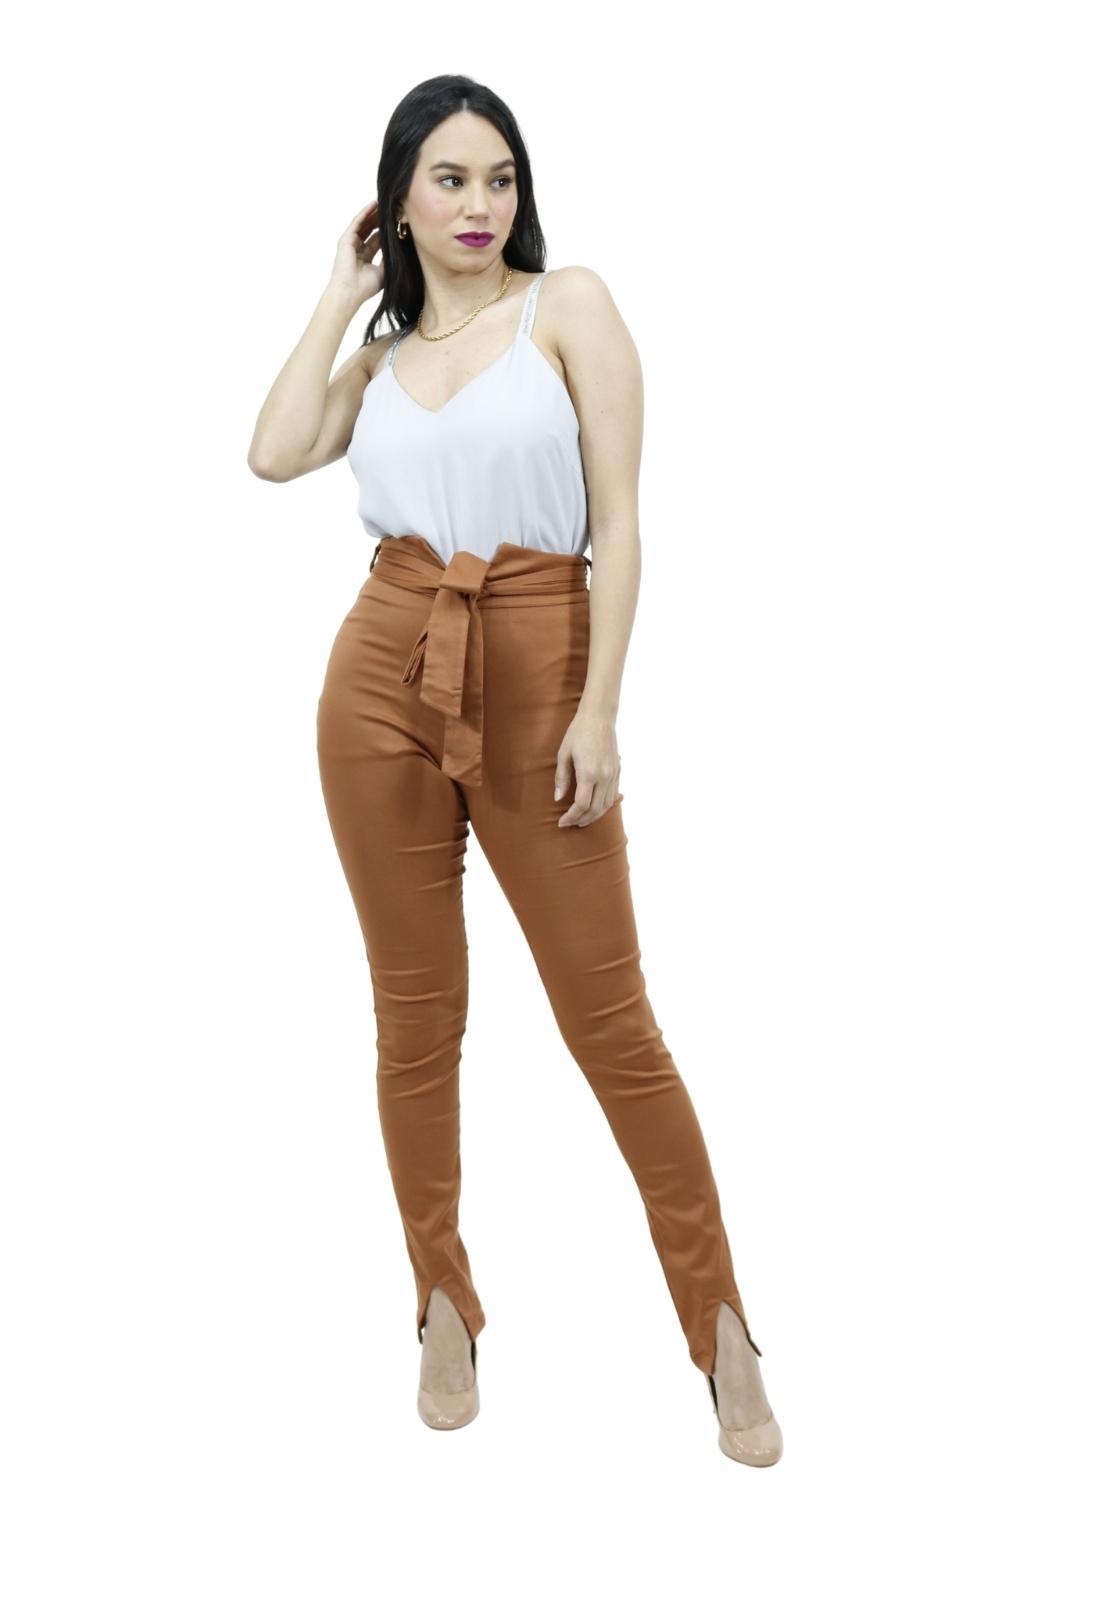 Calça Feminina Skinny Faixa Fixa Cintura Abertura Perna Sexy